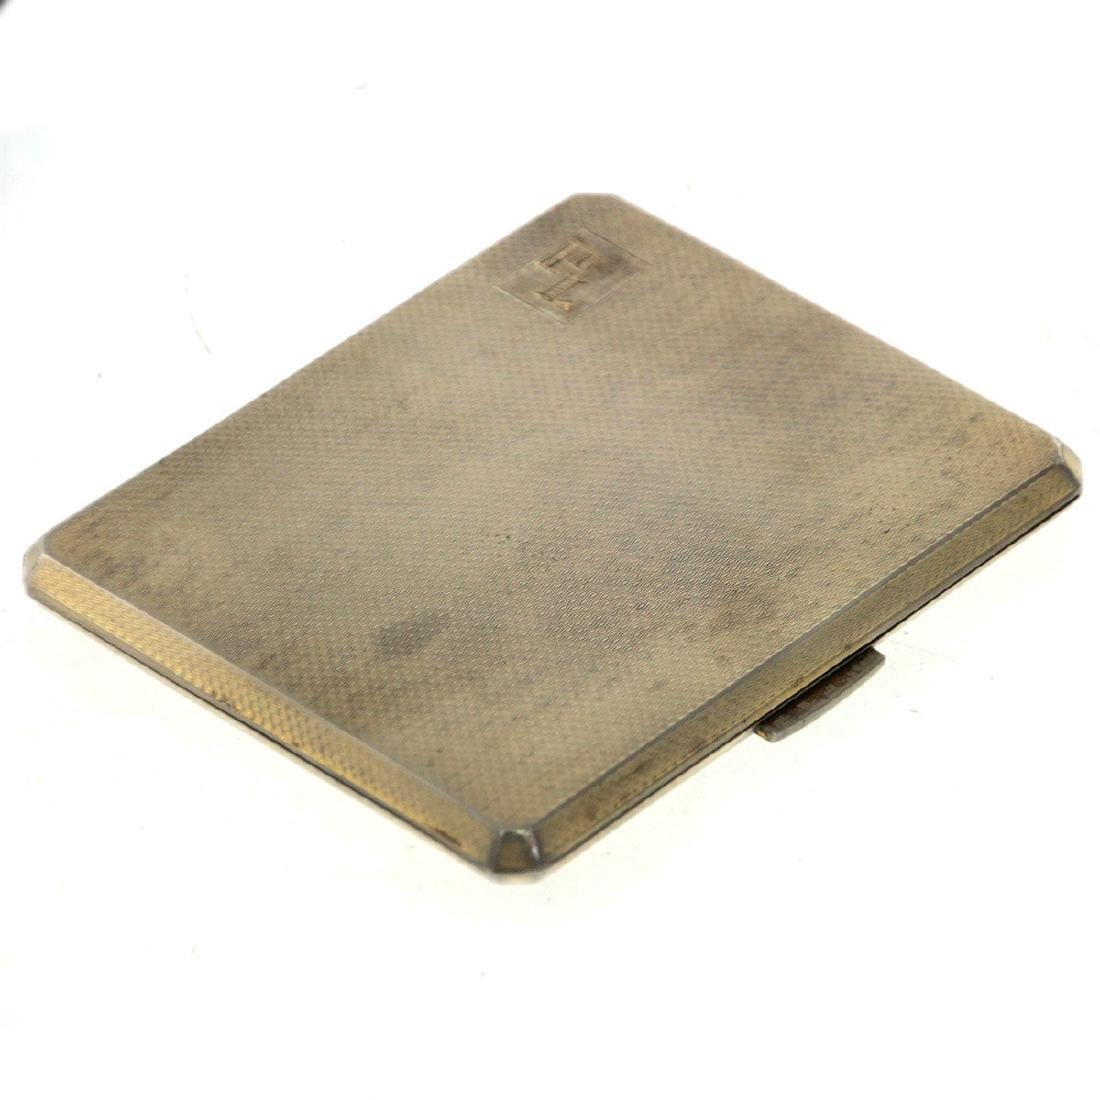 Mappin & Webb Sterling Silver Cigarette Case 1920